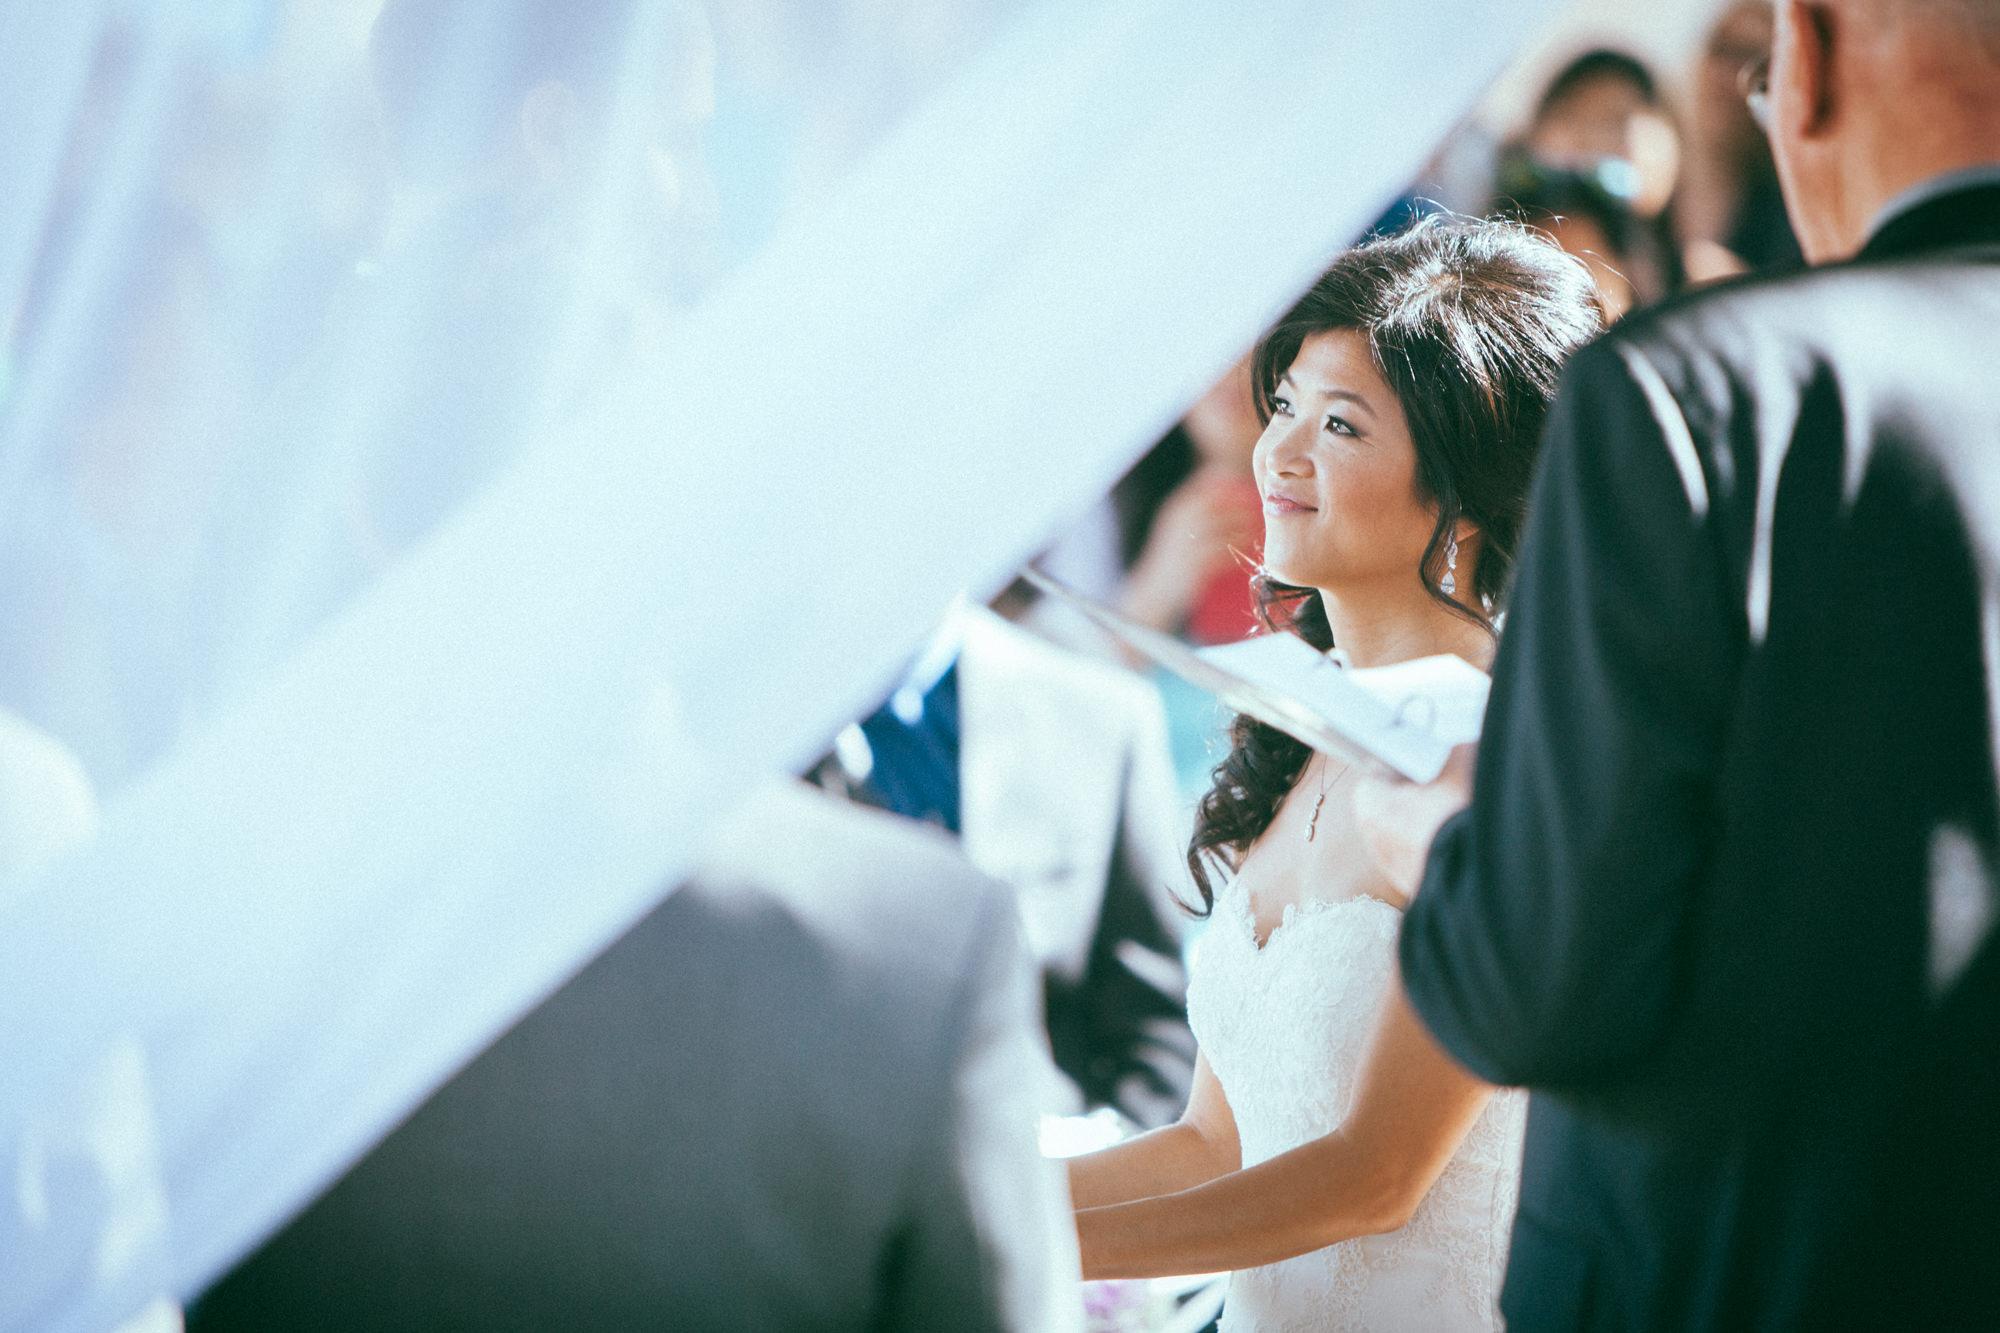 Alice_&_Aaron_Wedding_by_The_Light_&_Glass_Photography-064.jpg